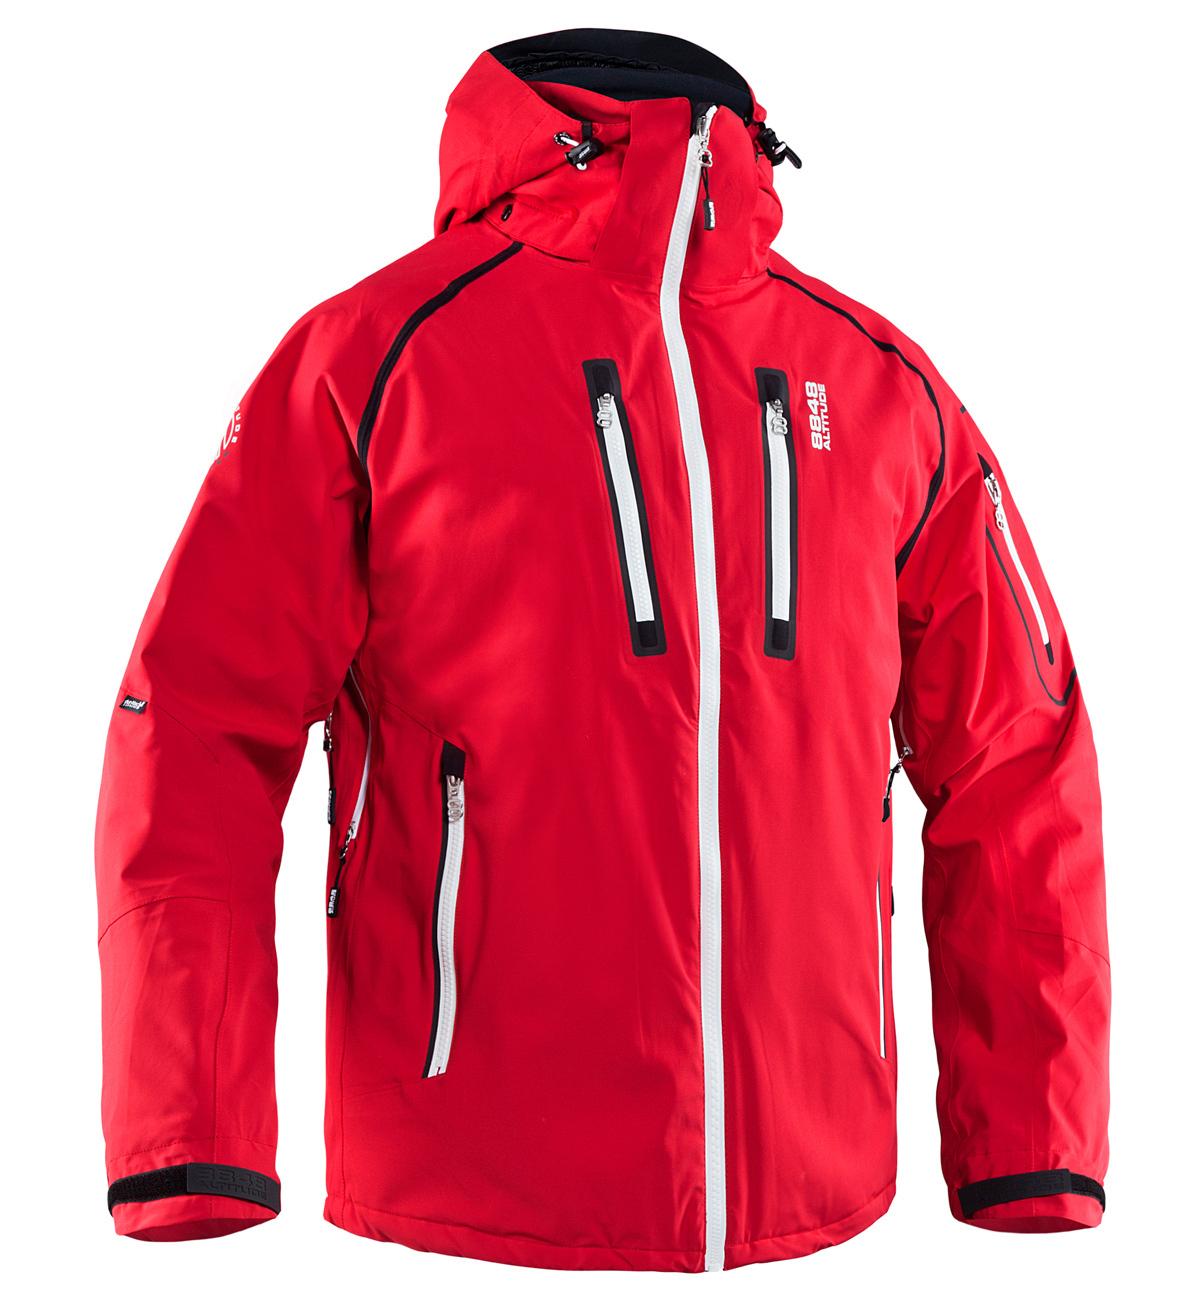 Горнолыжная куртка 8848 Altitude «LUNAR» Red